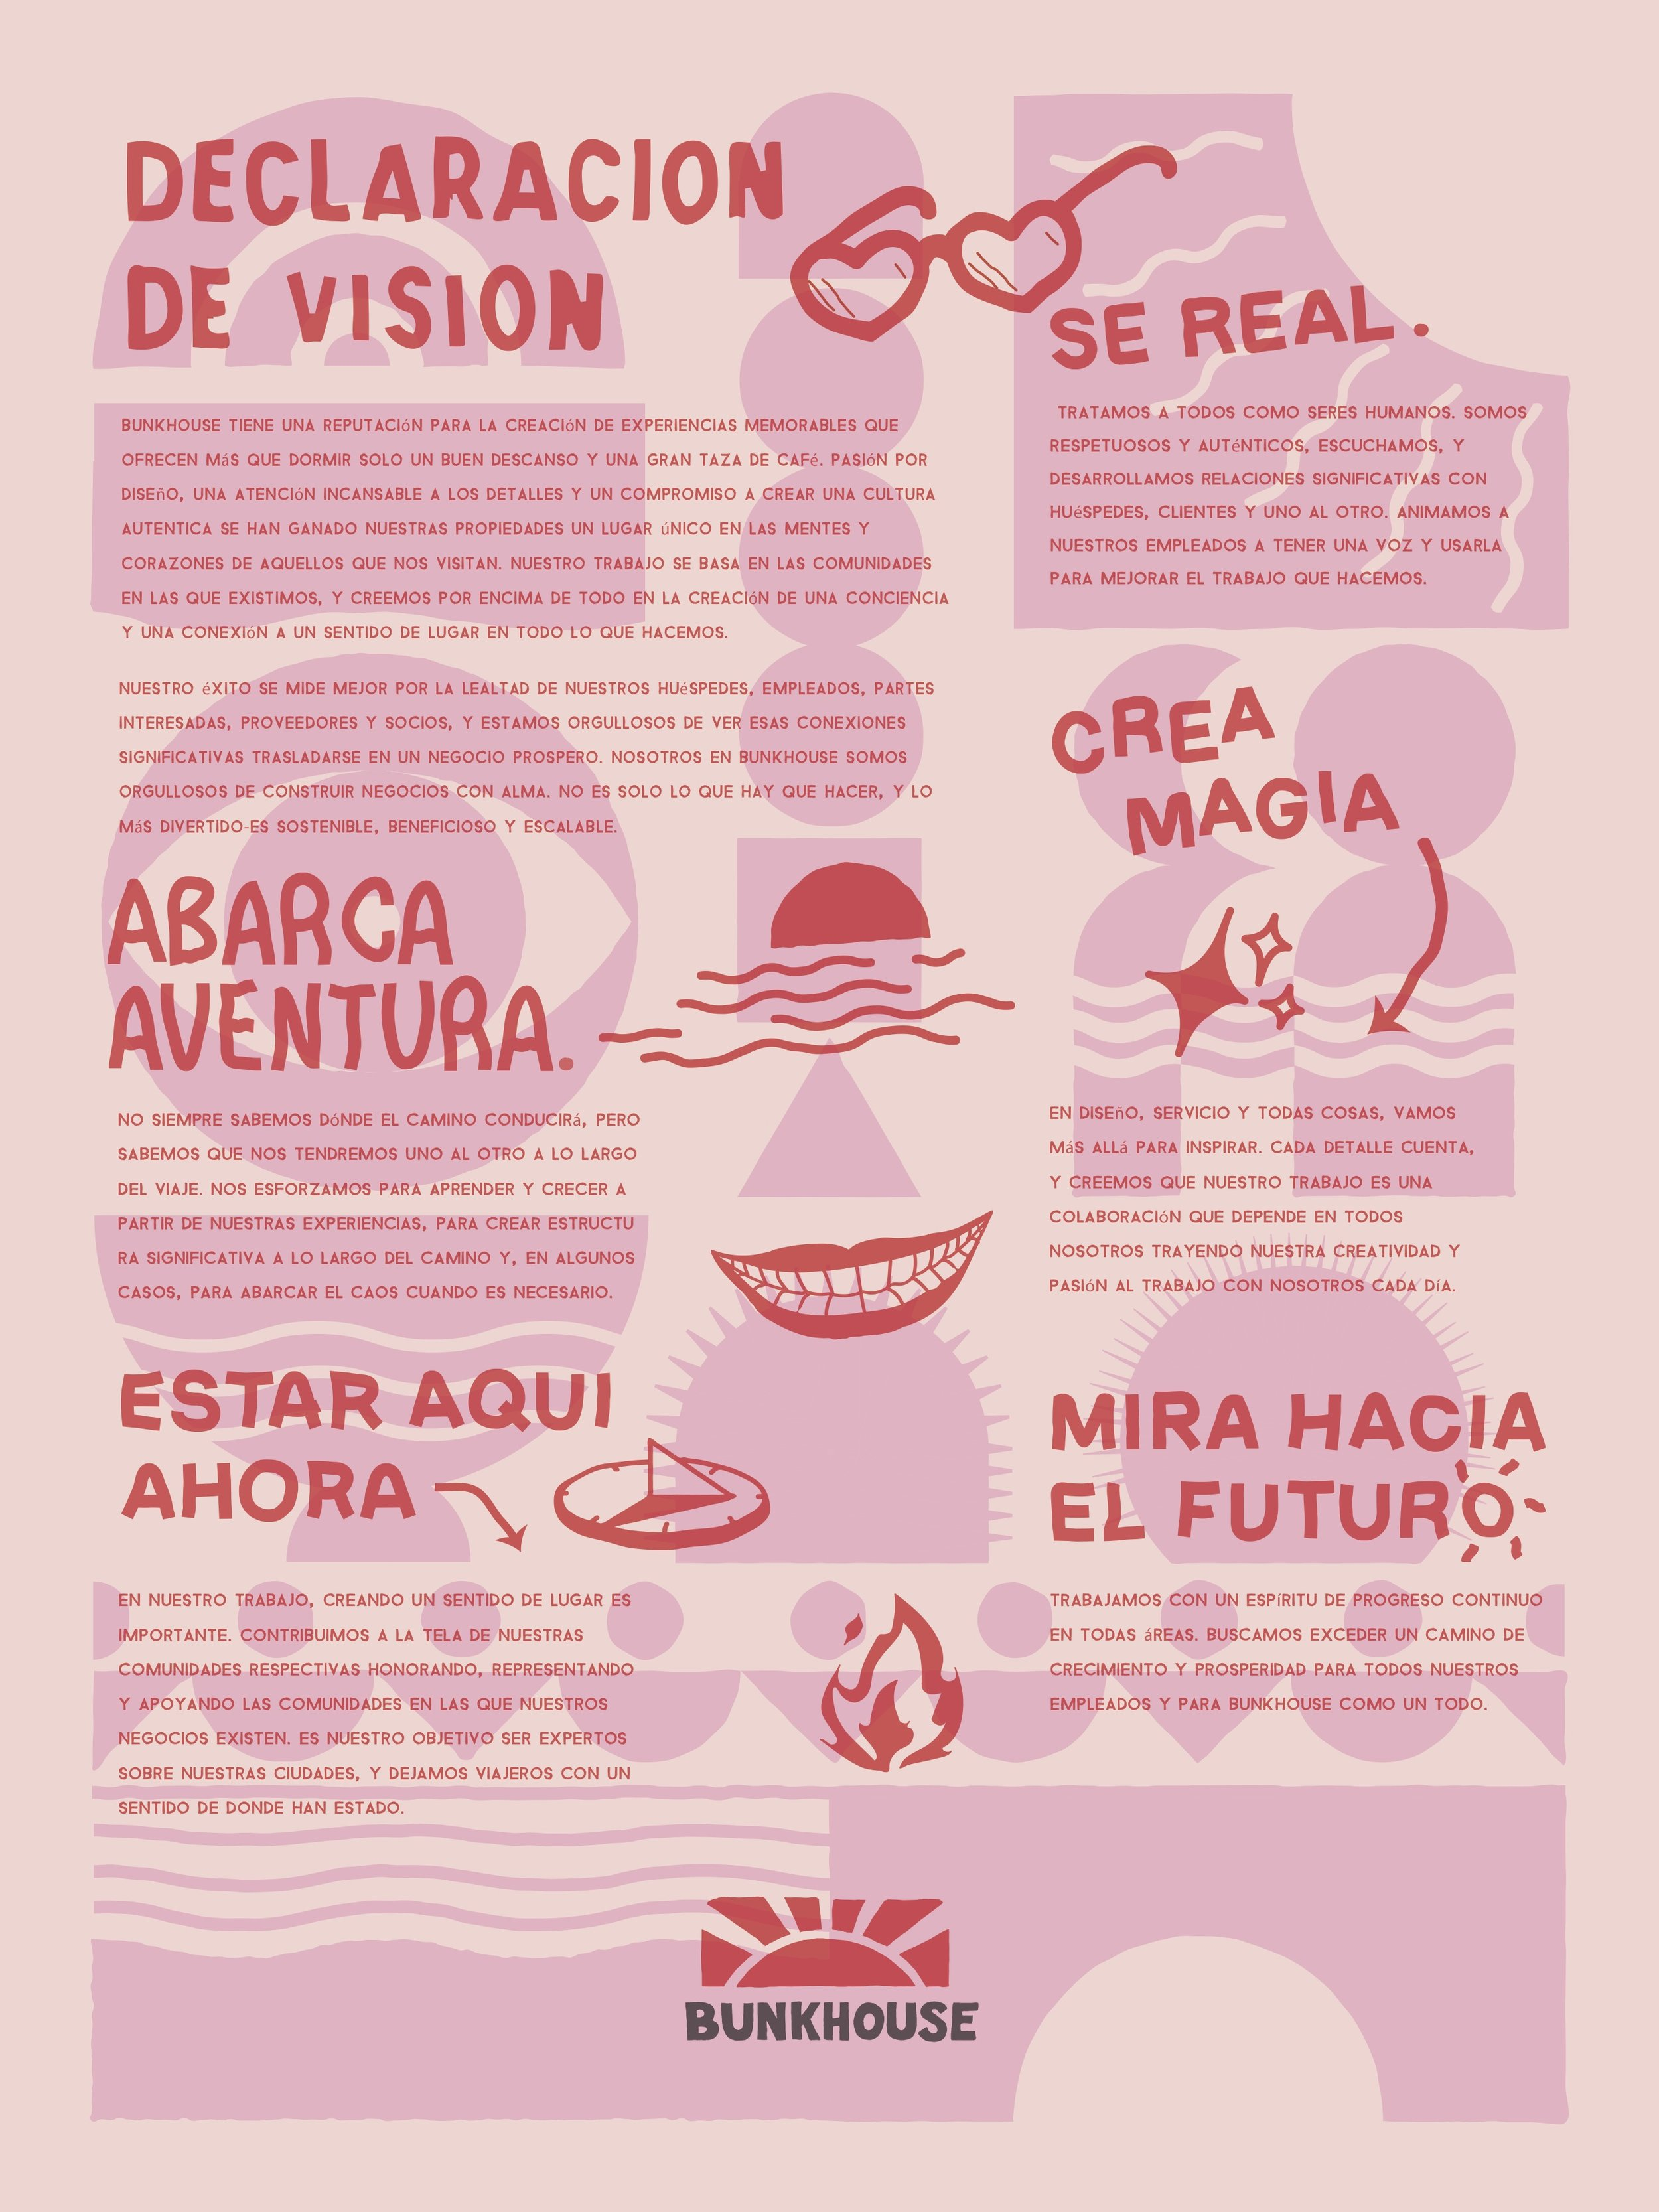 Vision Statement_espanol.jpg